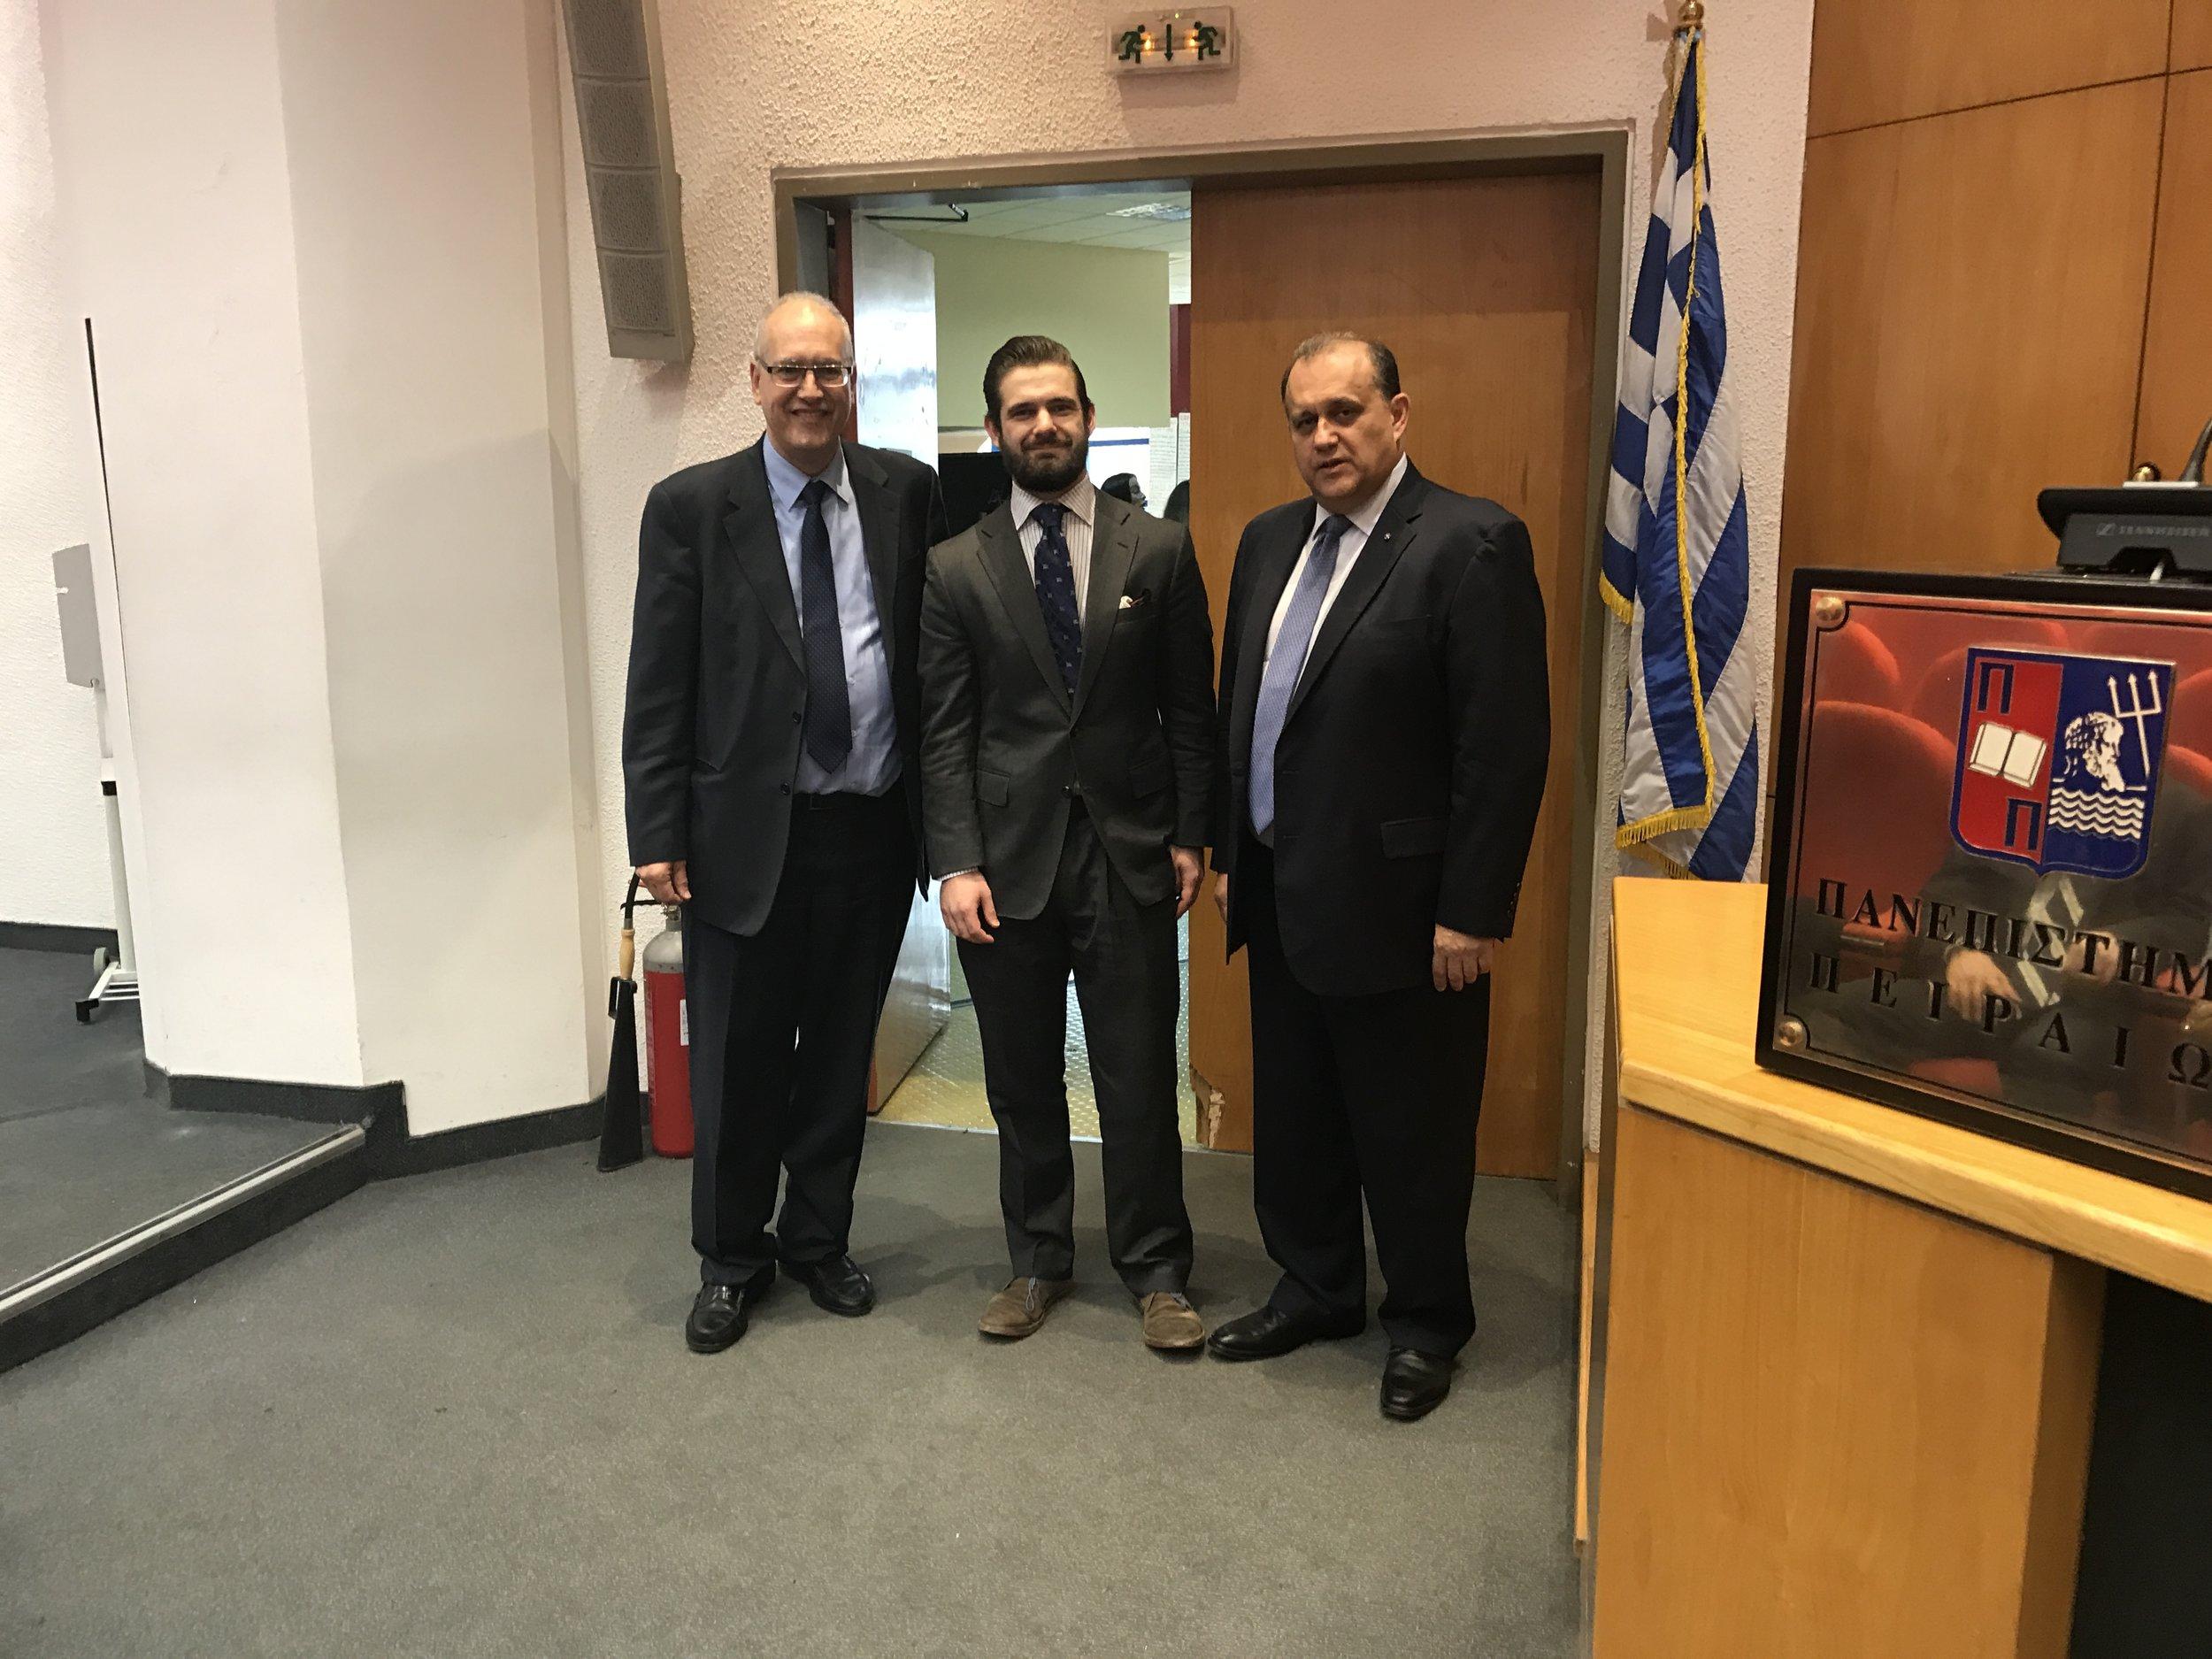 Evanghoras L. Evaghorou, Lecturer of International Relations at the University of Piraeus; Gregory Graves, and Nick Larigakis.